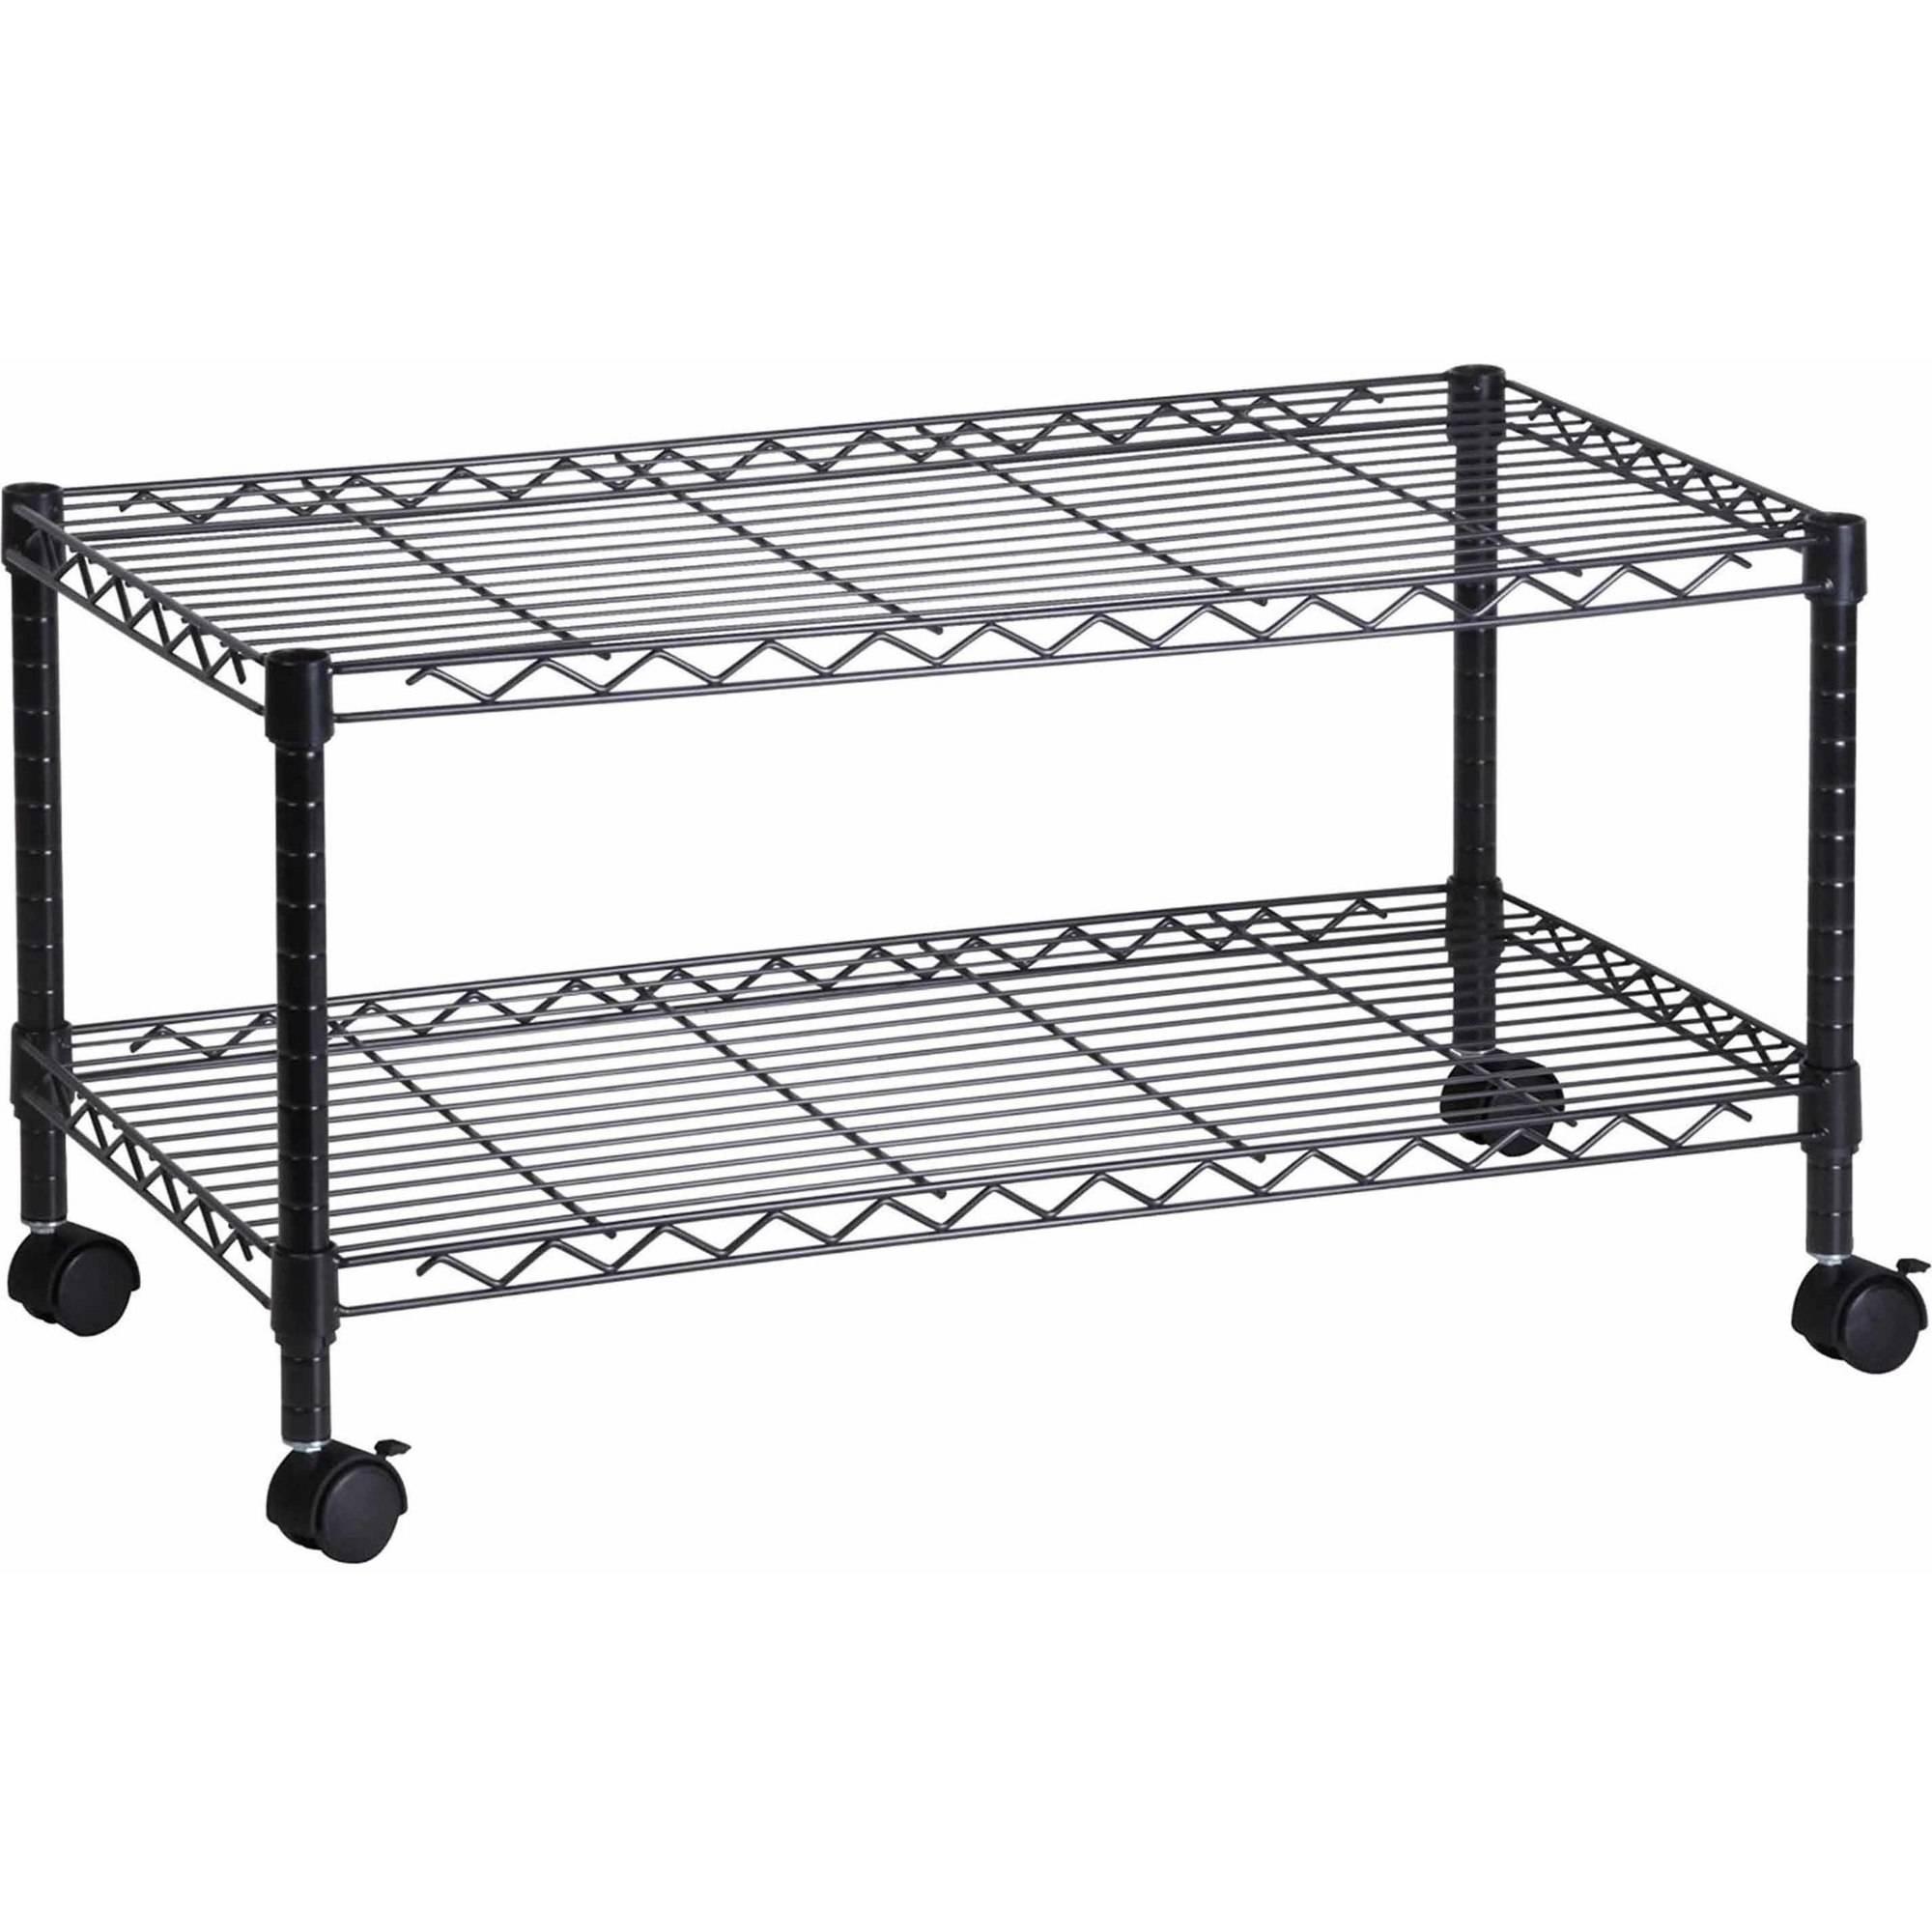 Honey Can Do Steel Media Rolling Cart with 2 Adjustable Shelves, Black